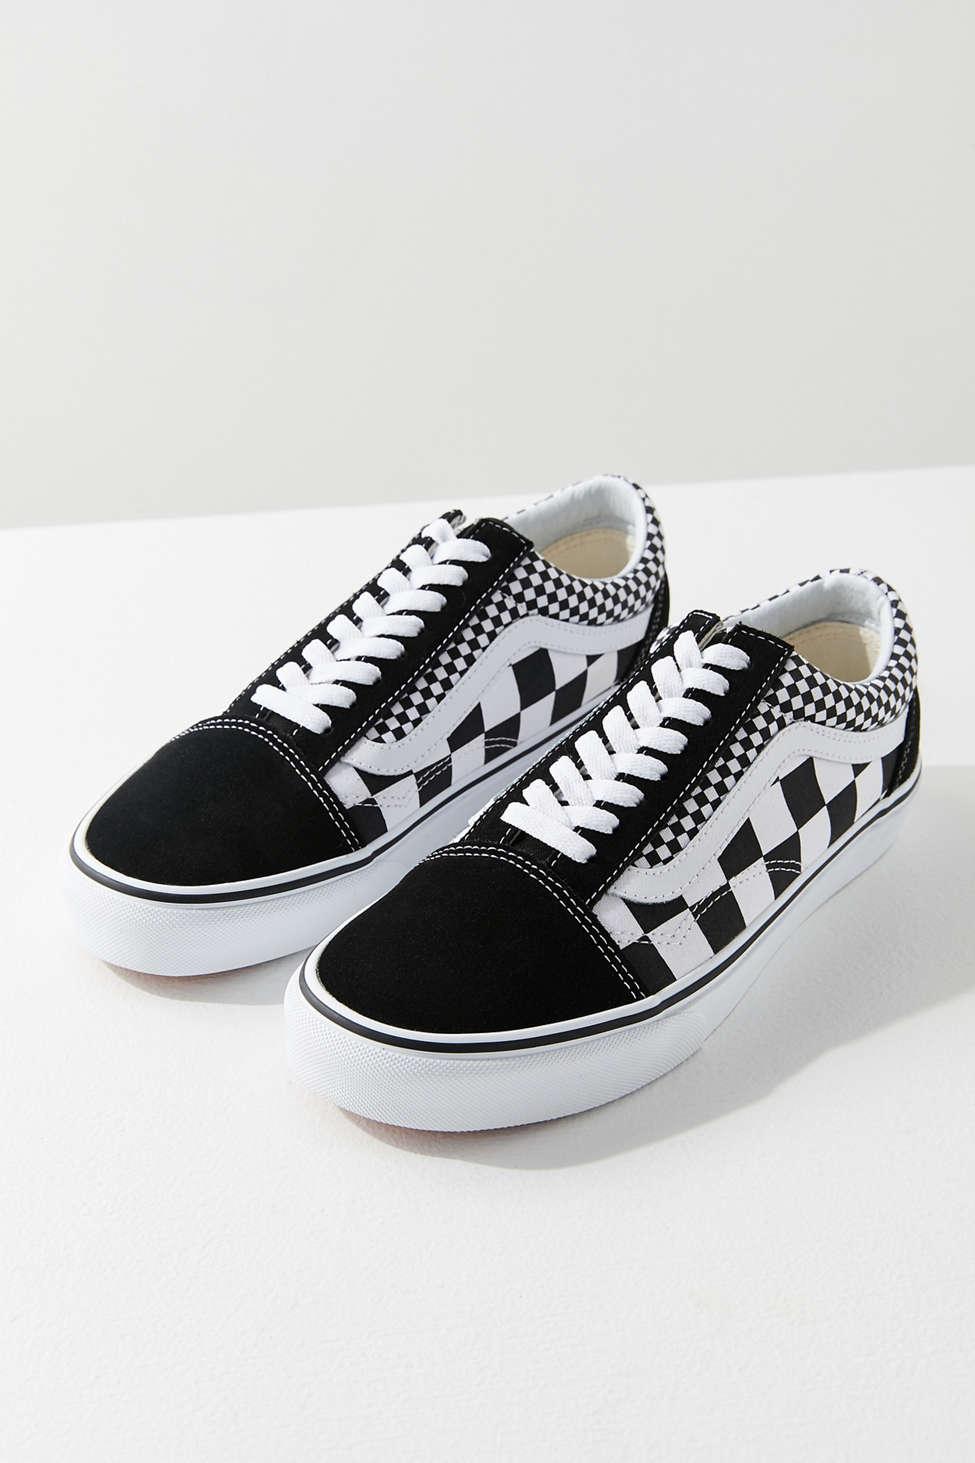 Vans Mix Checkerboard Old Skool Sneaker Urban Outfitters